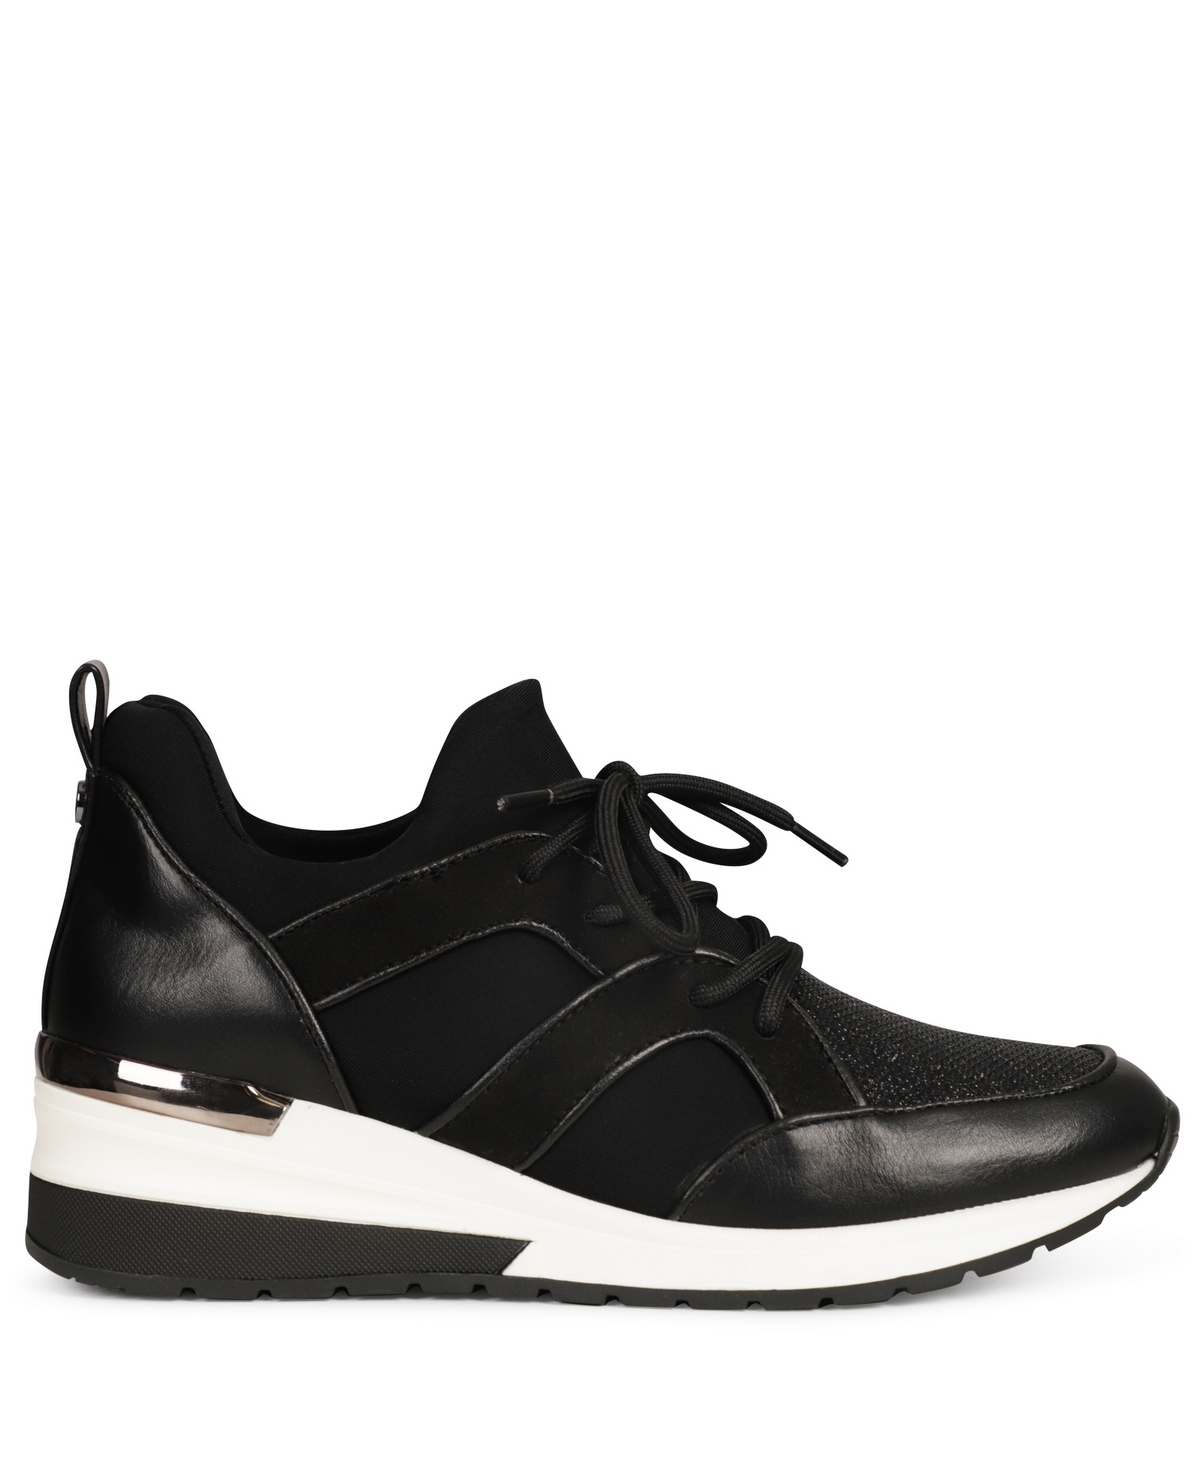 La Strada Sneaker Zwart 1900356